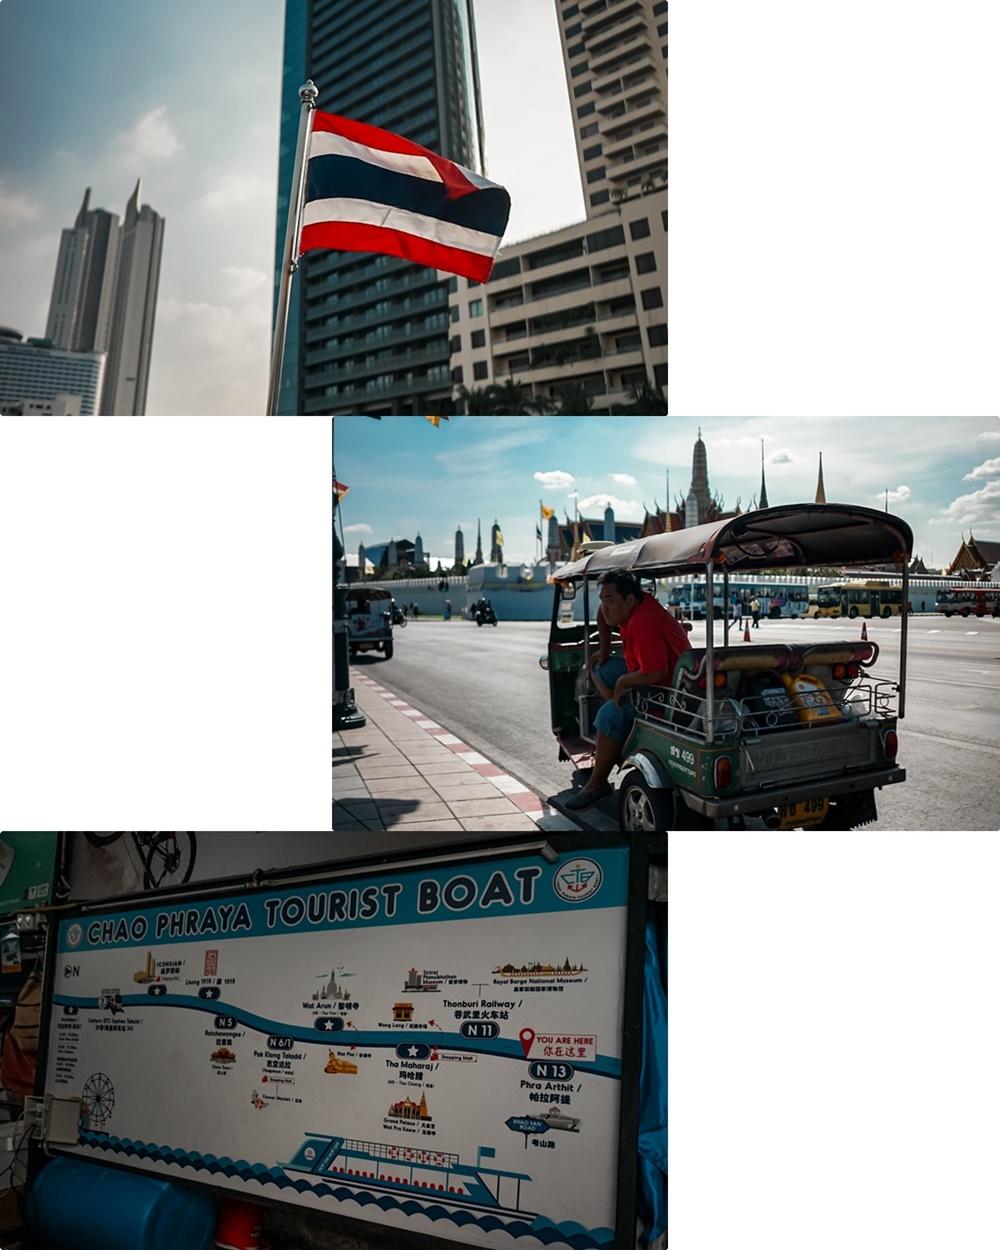 Thailand Flagge, Tuk Tuk in Bangkok & Chao Phraya Tourist Boat Karte